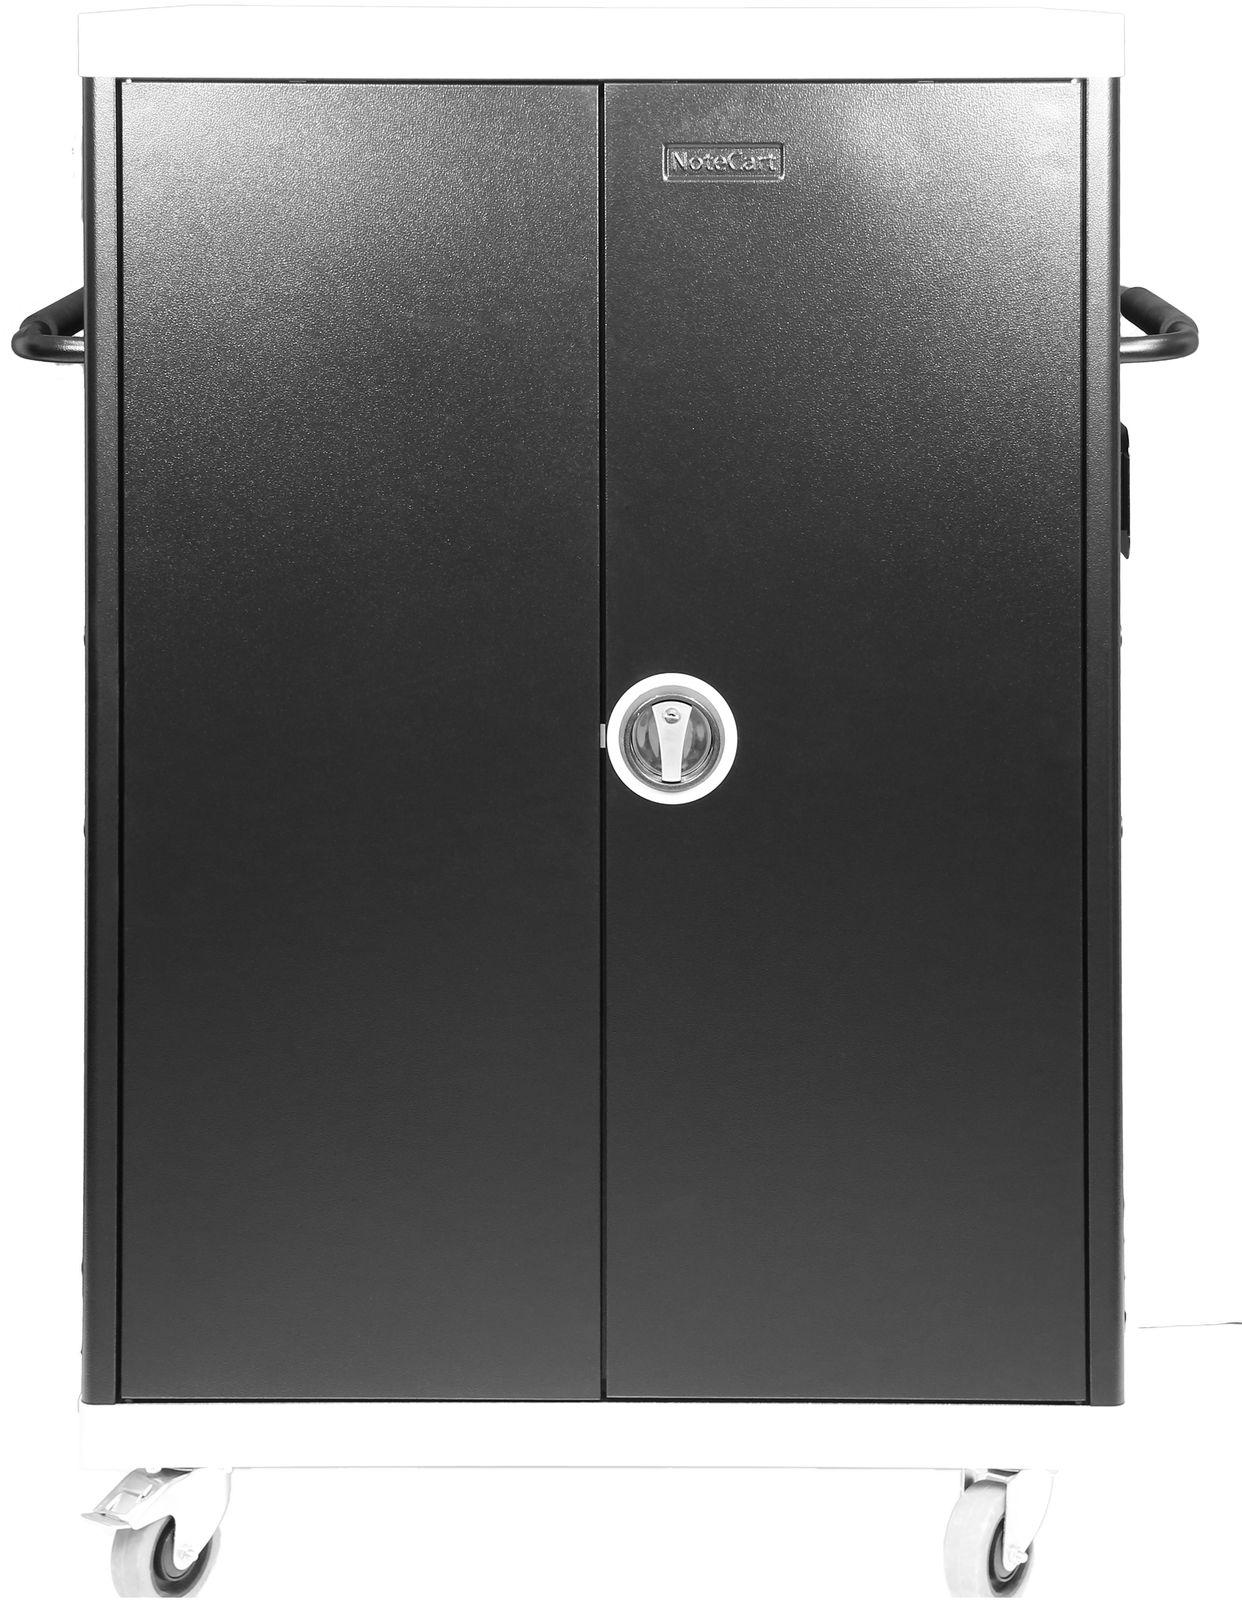 Leba NoteCart Unifit for 32 Laptops Fix shelv. 32 DK power sockets NCU-32-FH-419-DK - eet01